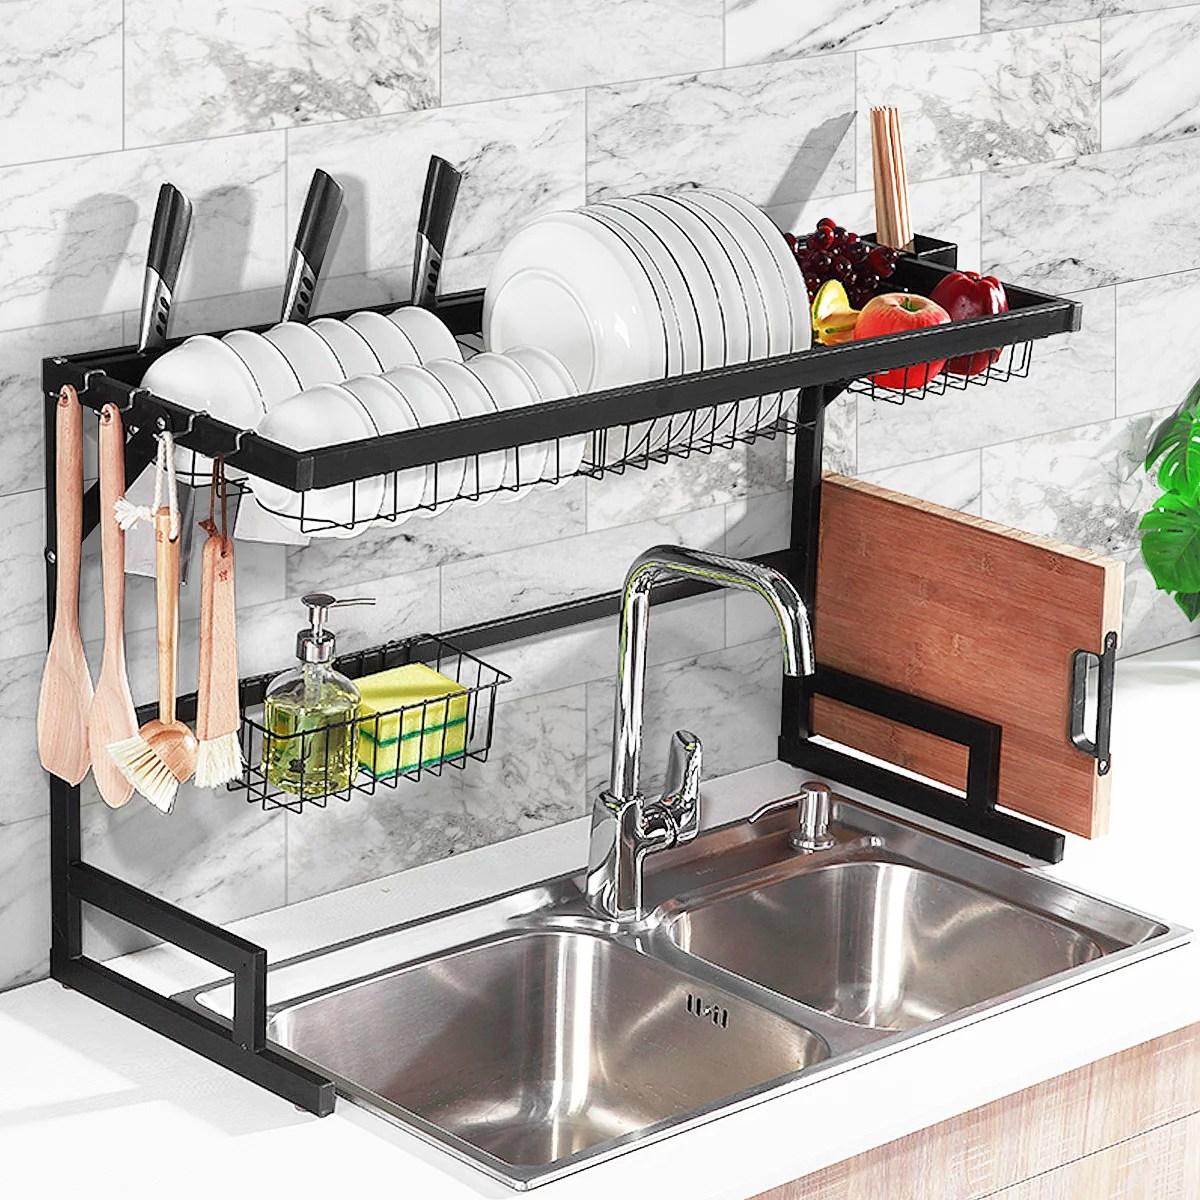 2 tier sink rack dish drainer kitchen sink rack storage rack over the sink dish rack stainless steel metal pp